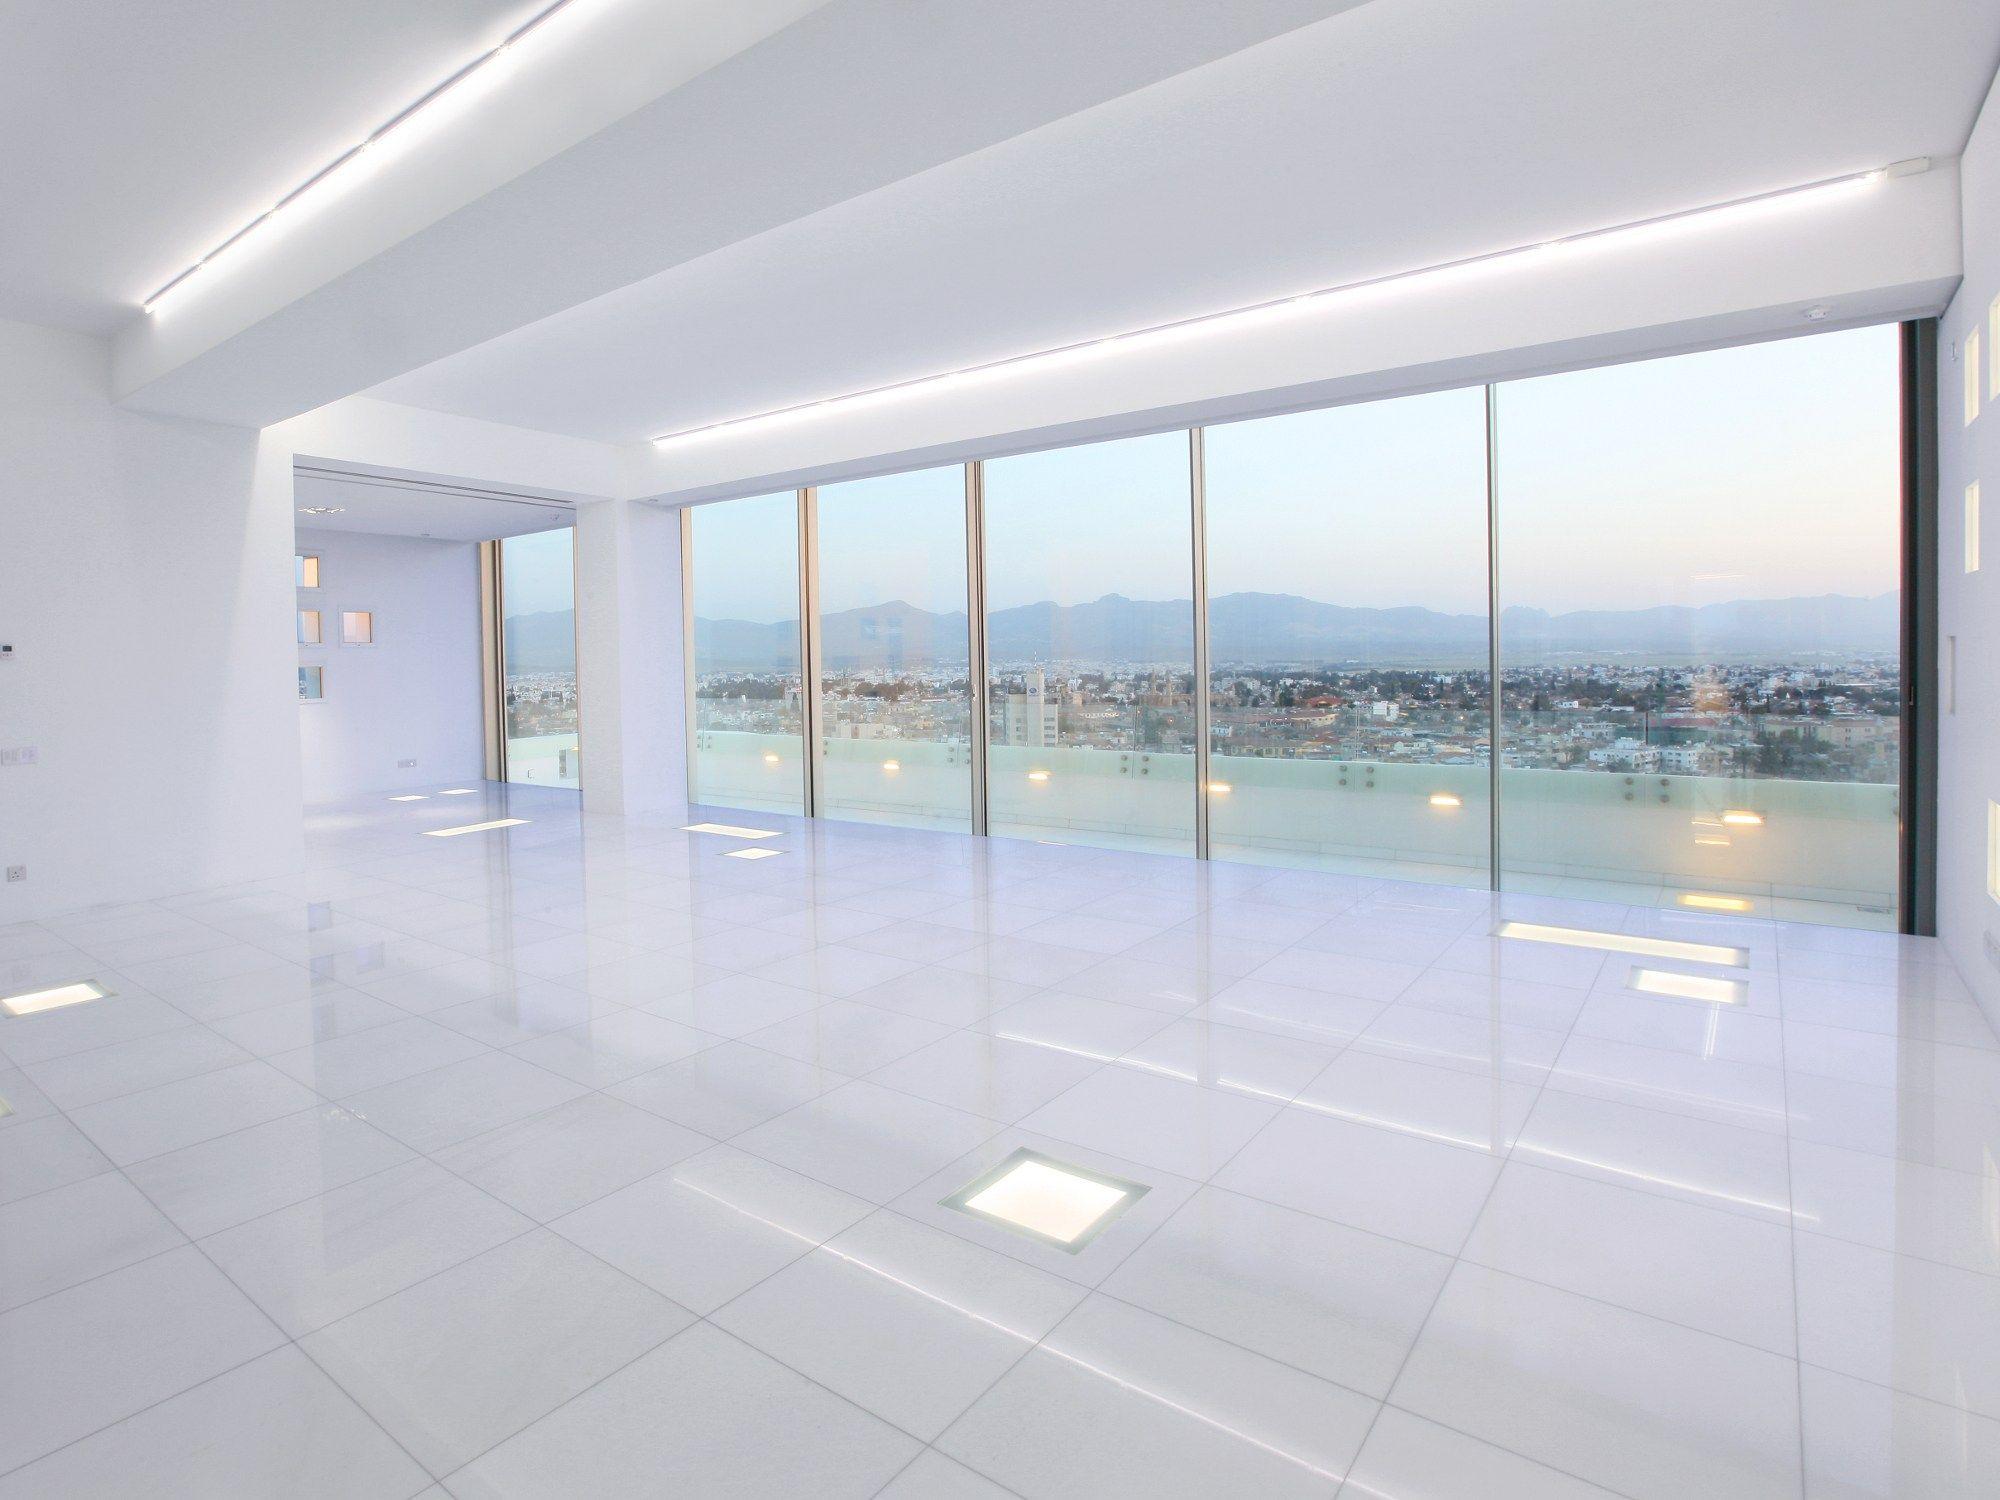 Fen tre coulissante en aluminium avec triple vitrage keller minimal windows 4 - Fenetre triple vitrage aluminium ...